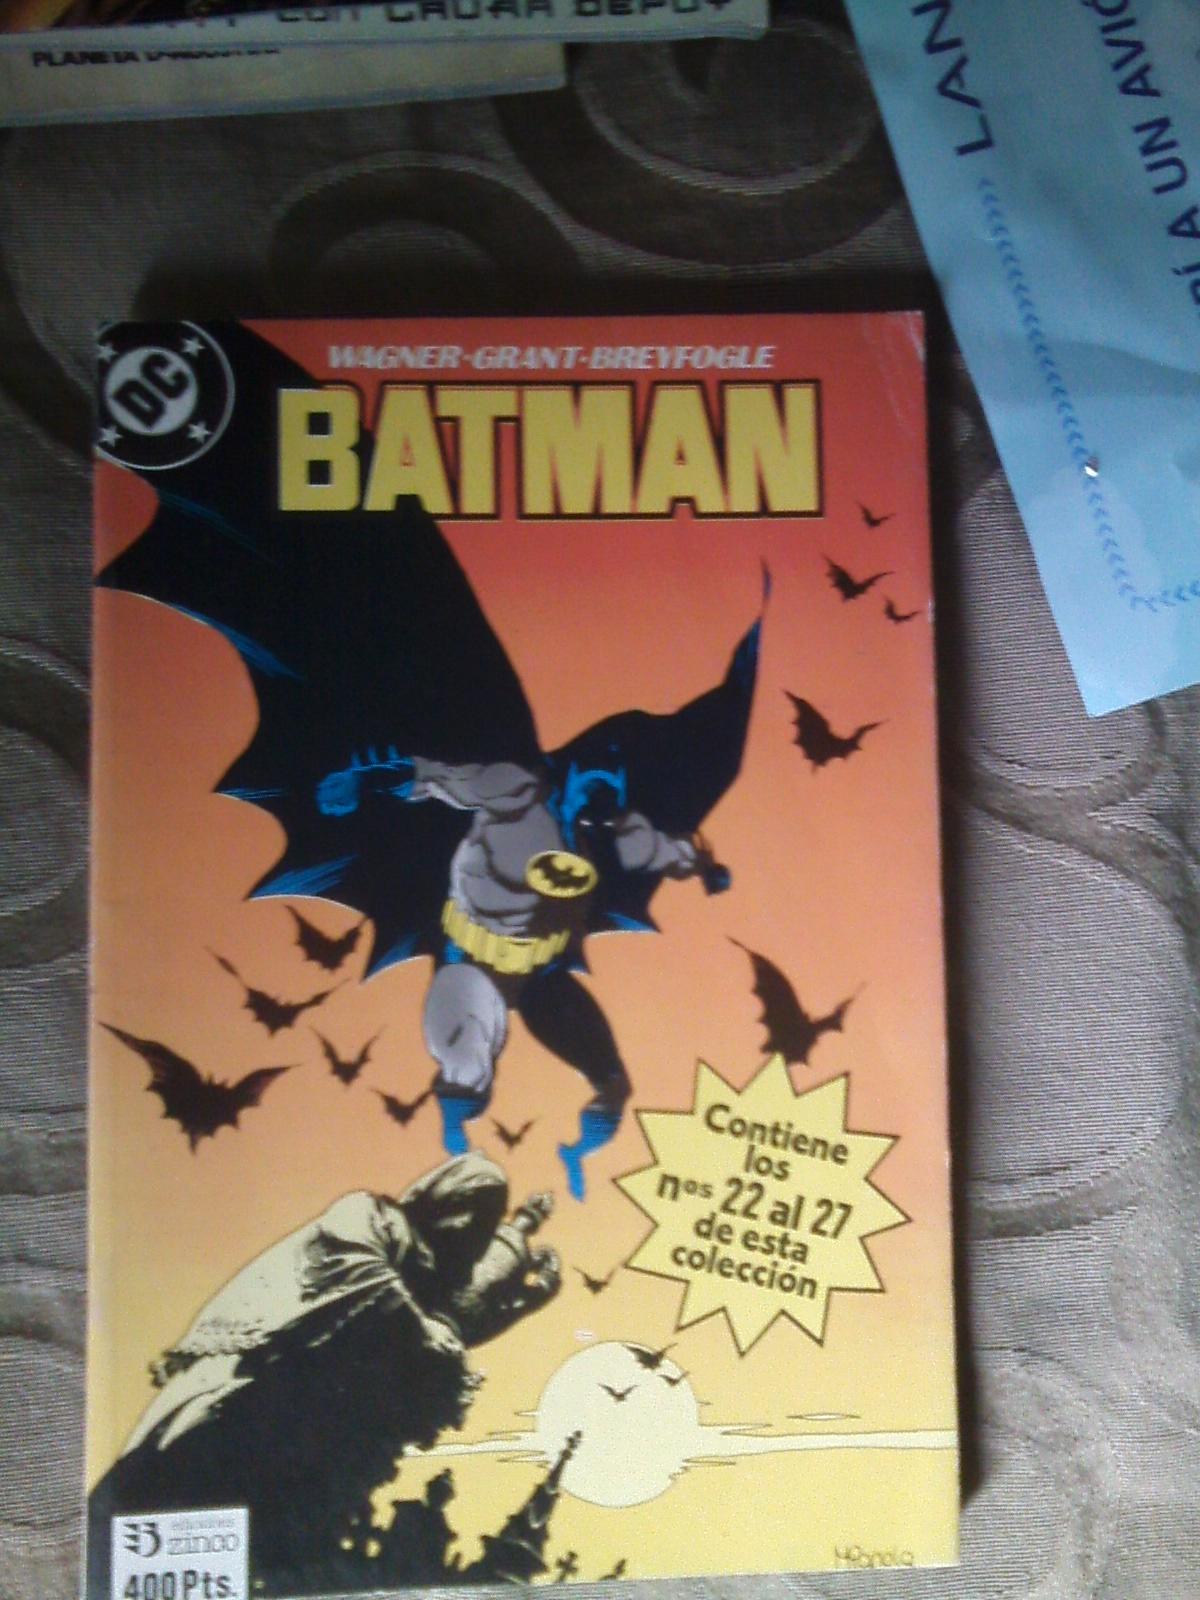 [Comics] Siguen las adquisiciones 2015 - Página 9 CAM05276